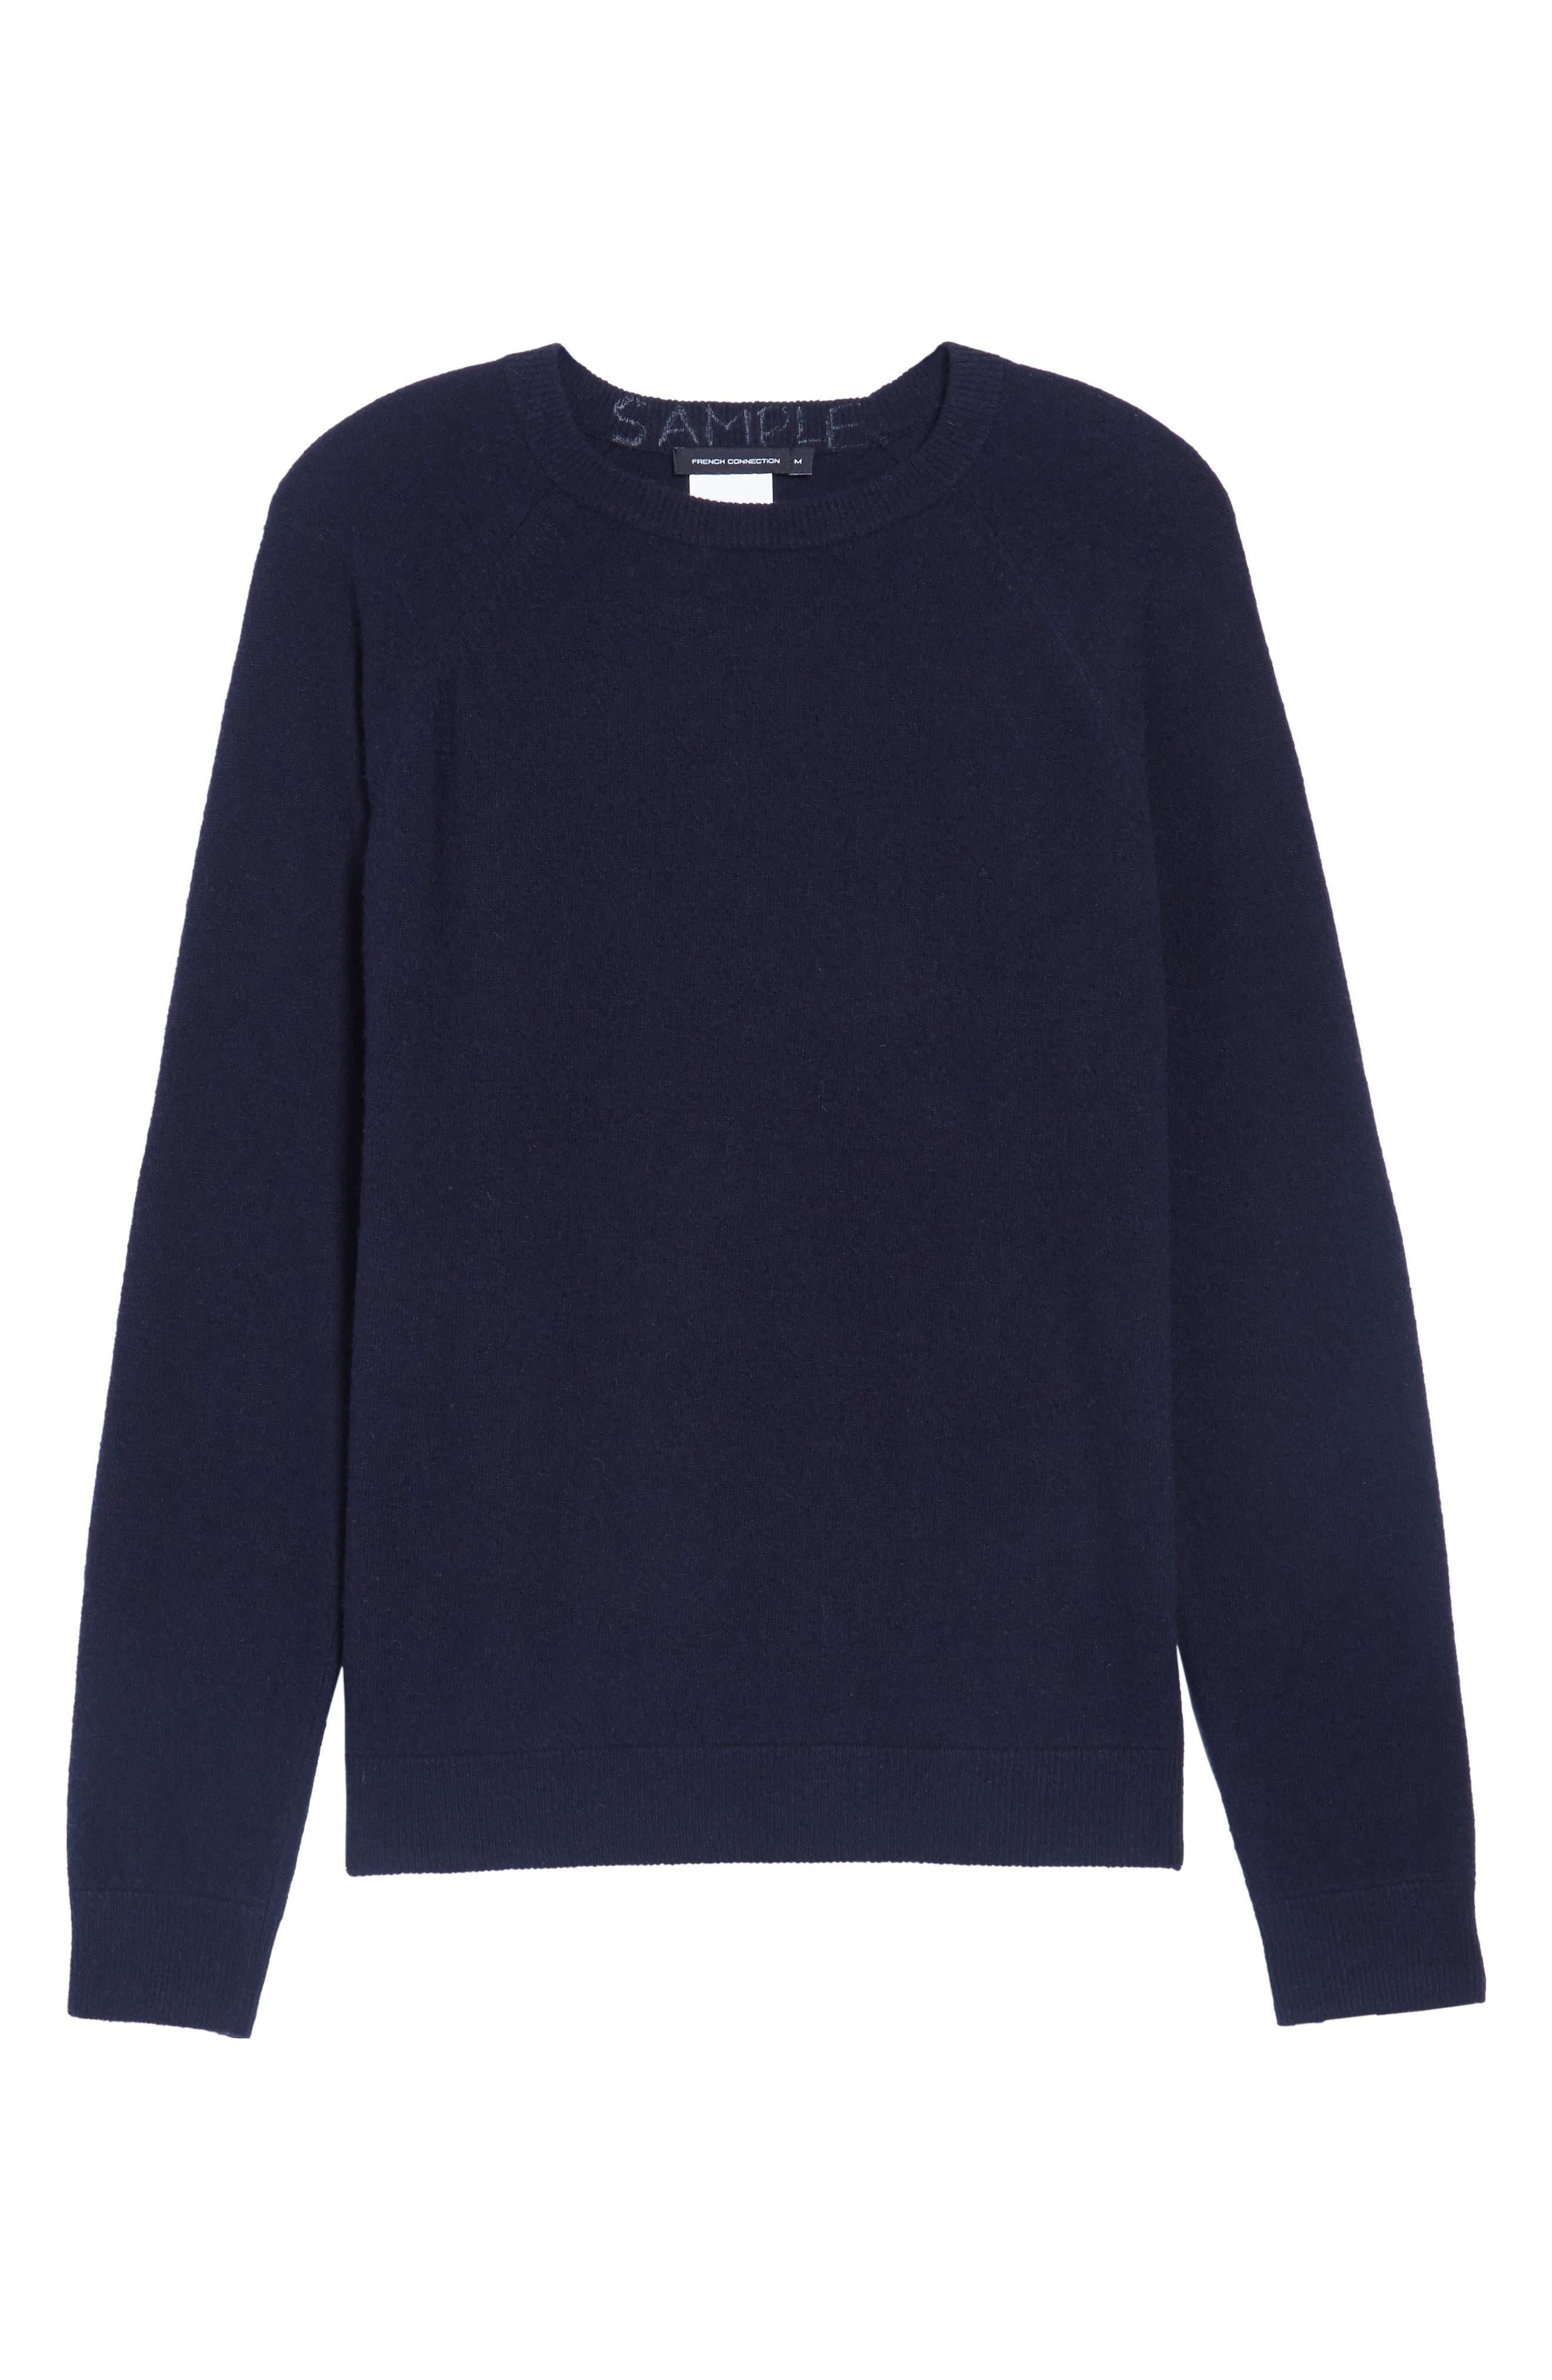 Crewneck Wool Sweater,                             Alternate thumbnail 6, color,                             Marine Blue/ Tartan